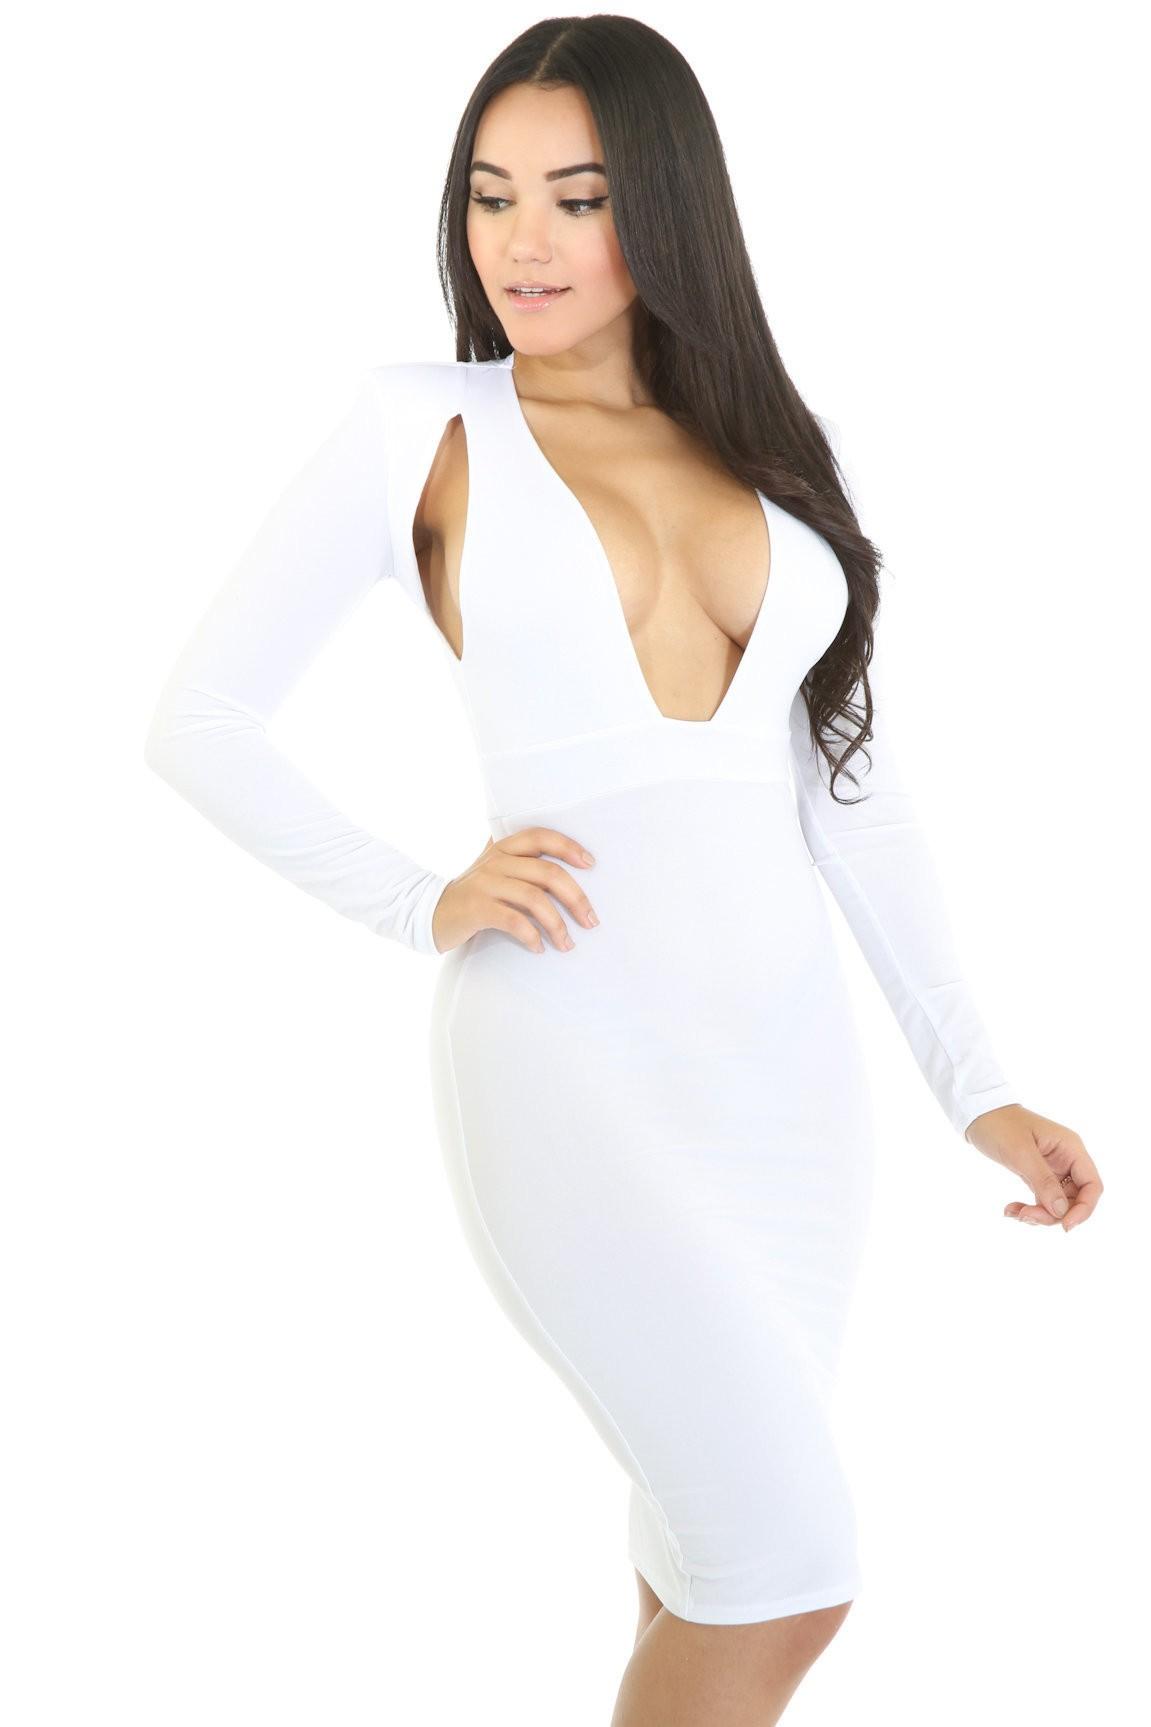 Elegant Surreal Dress